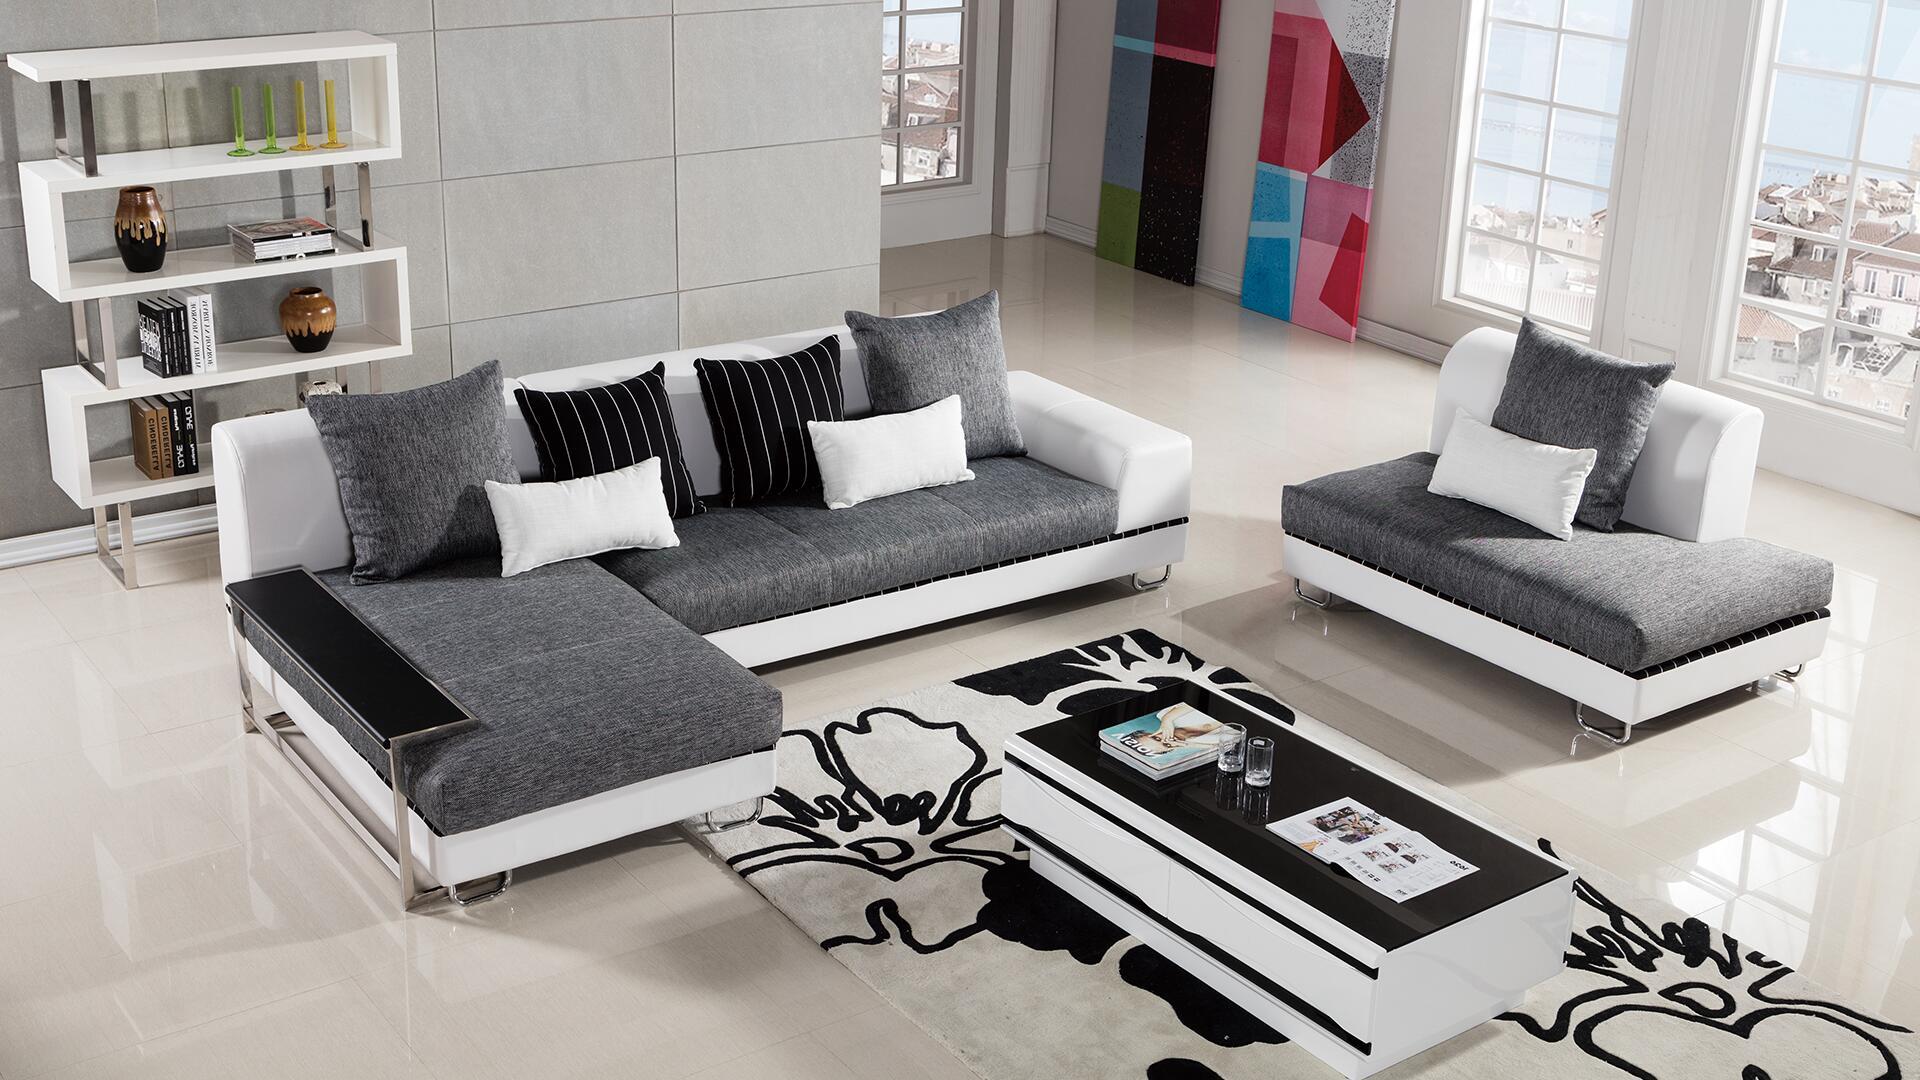 American Eagle Furniture AEL131R